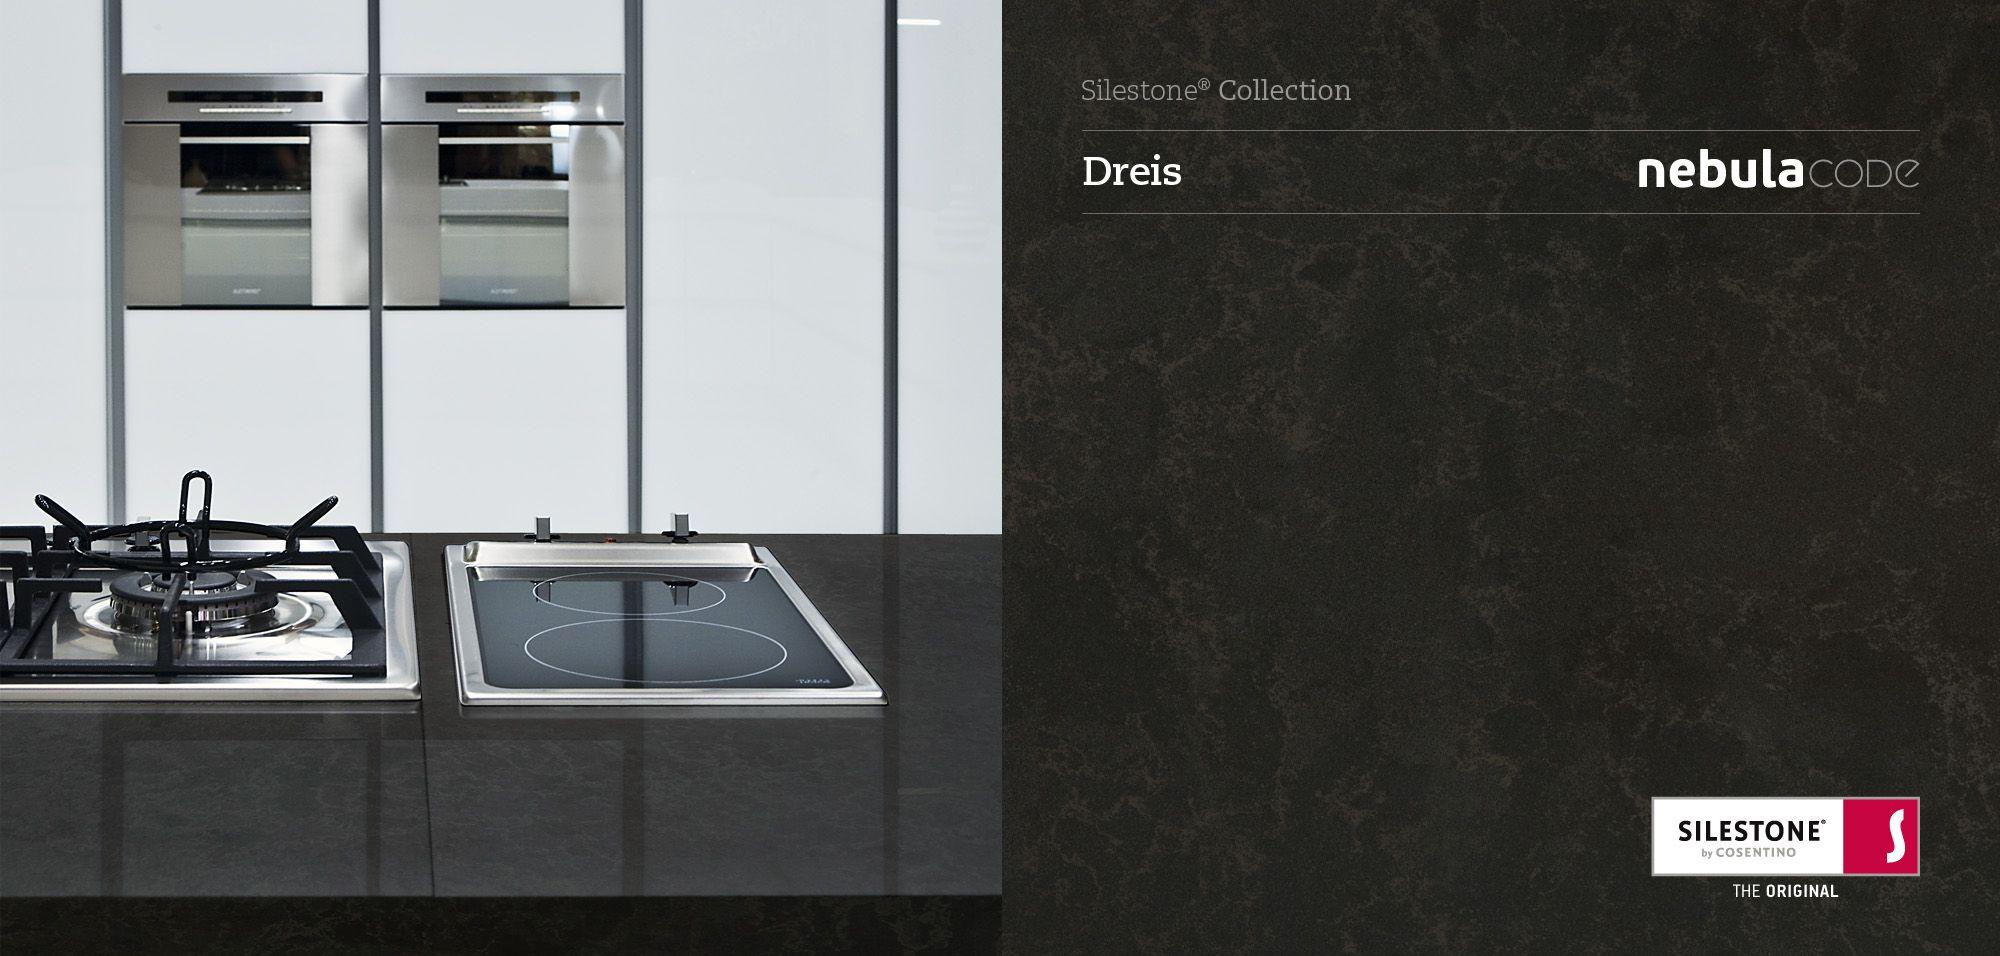 elegant kitchen cabinets las vegas lowes ideas silestone dreis- nebula code   collection by ...